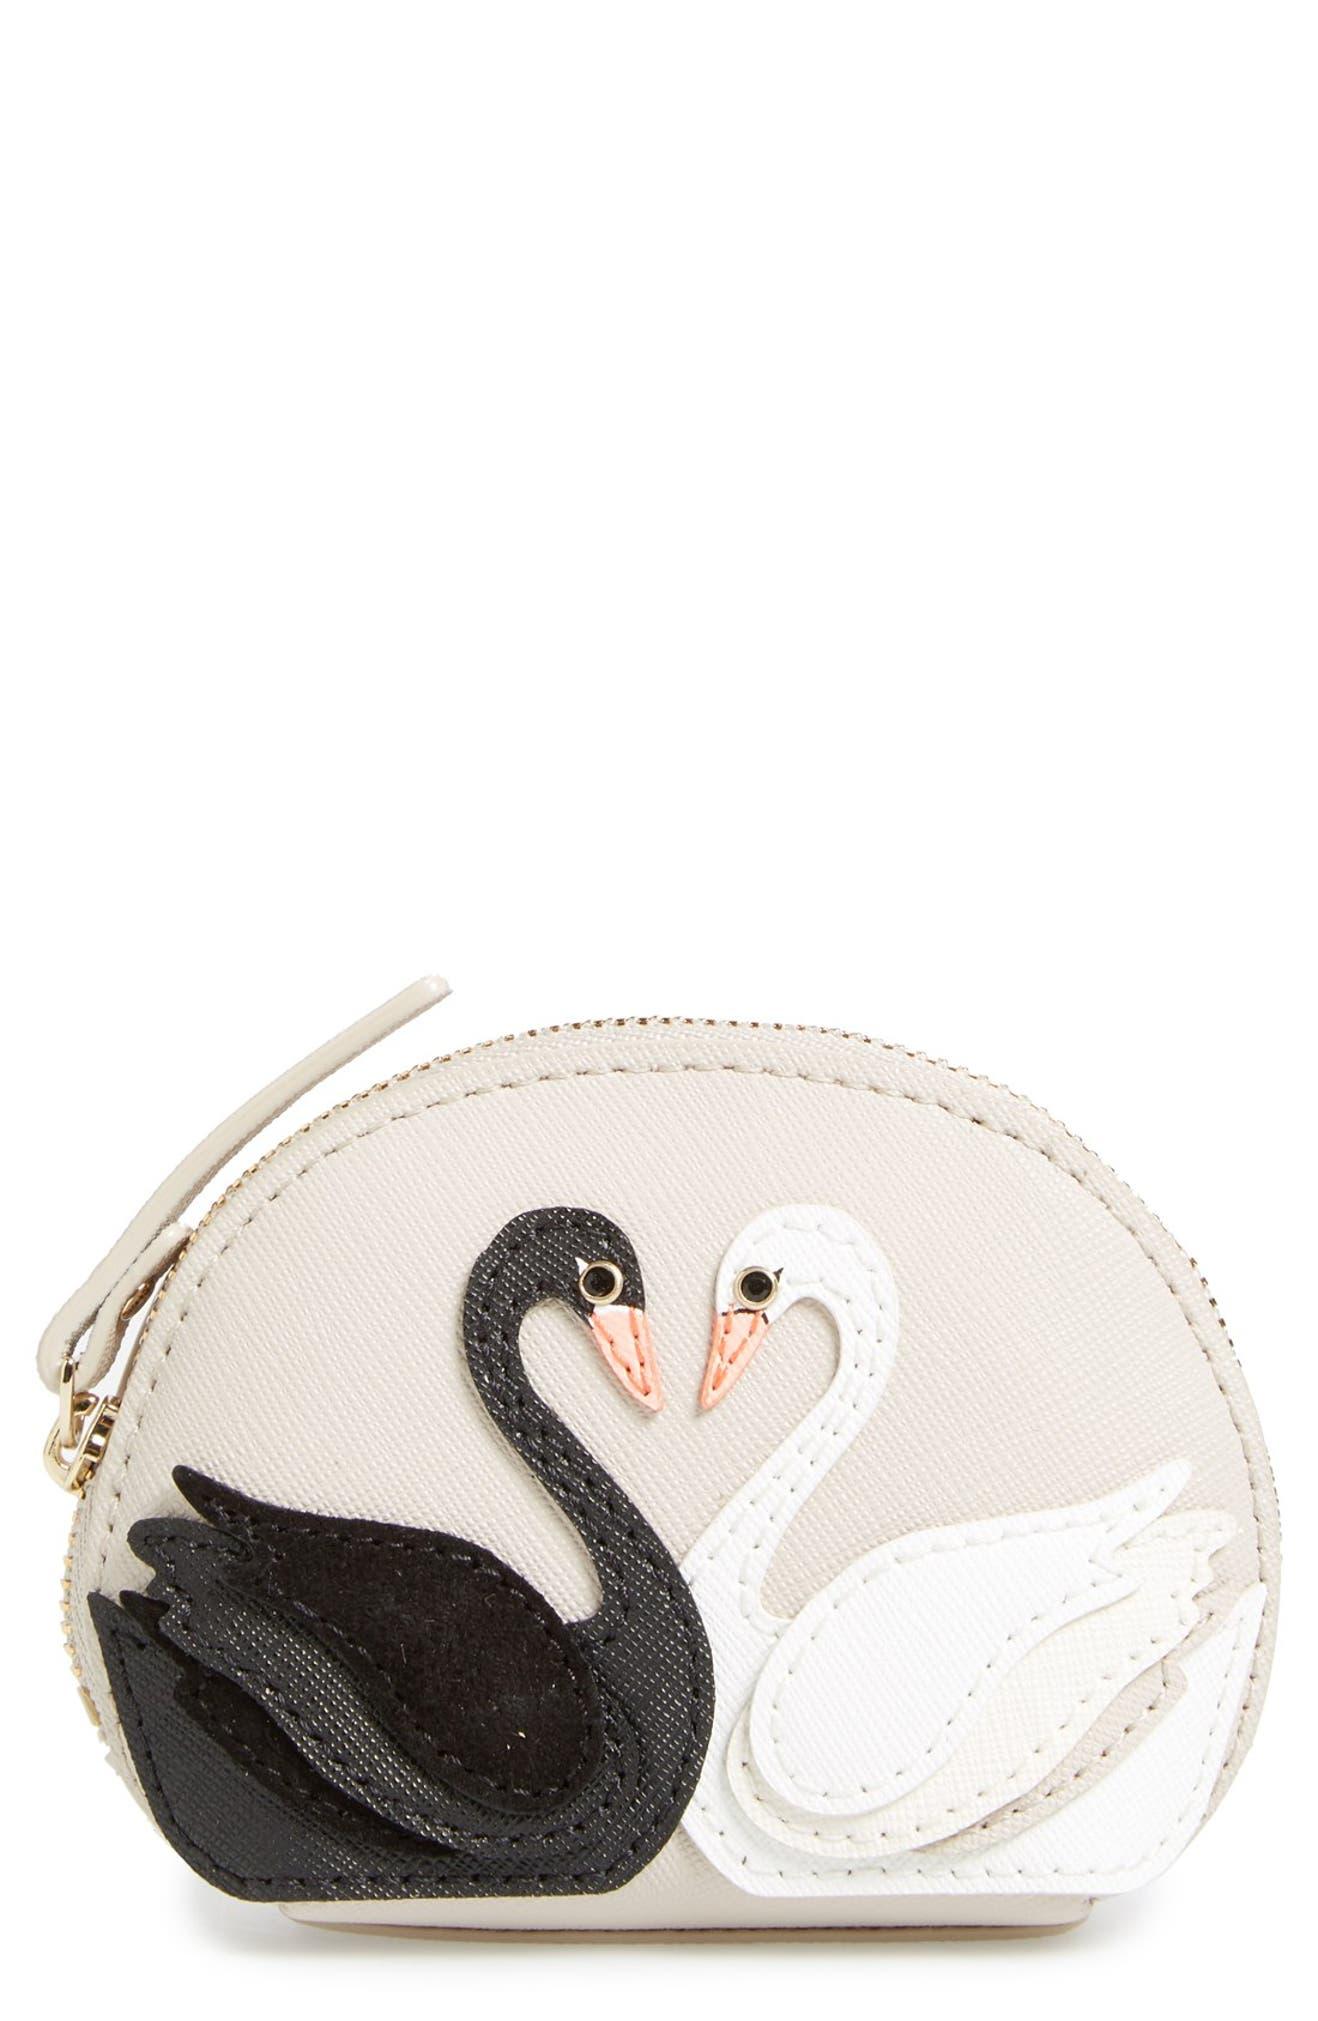 0069b587449e kate spade new york 'on pointe - swan dumpling' coin purse | Nordstrom